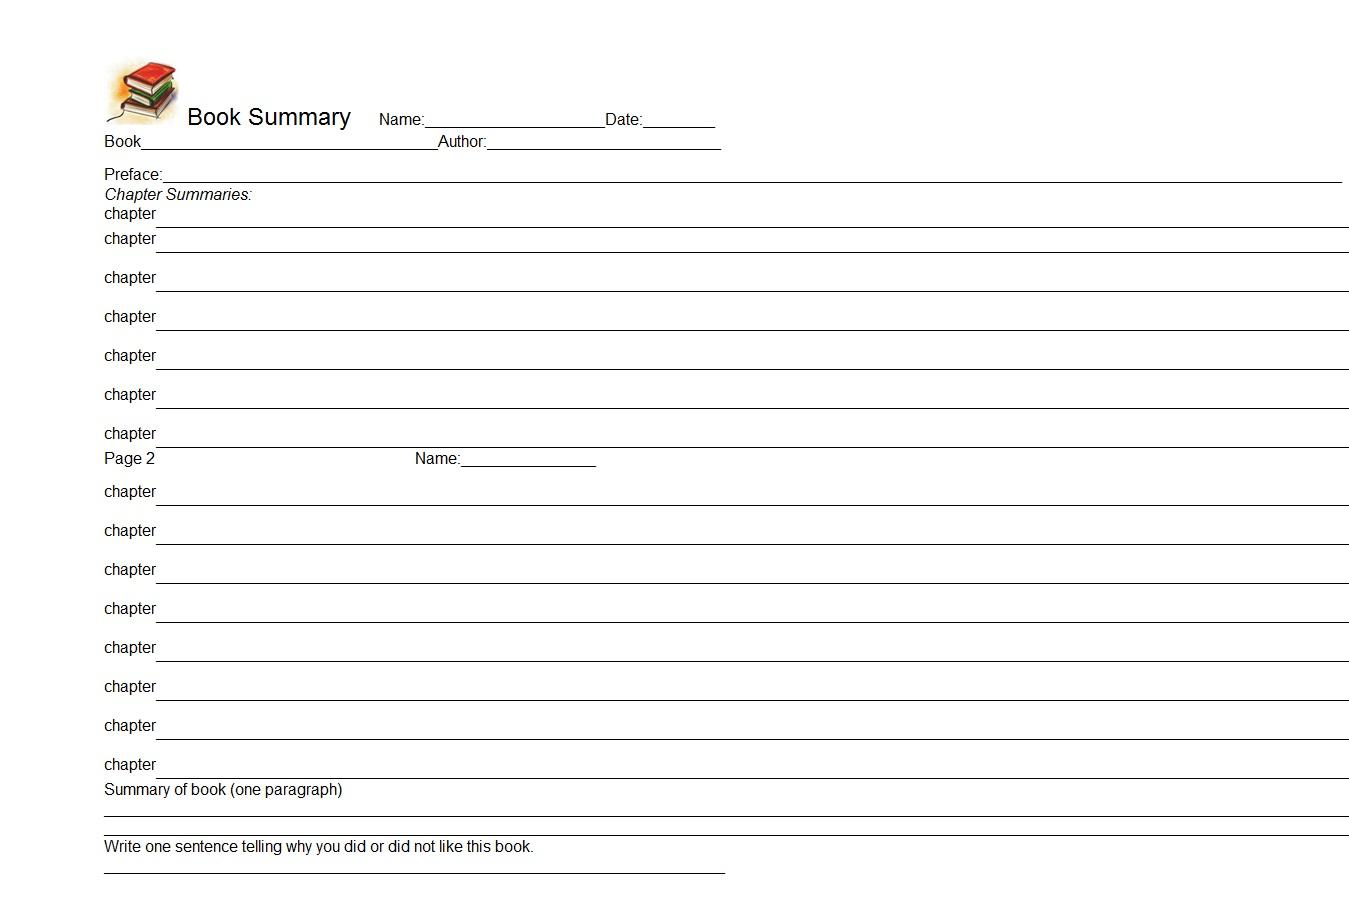 Book Summary Word Template Template Sample